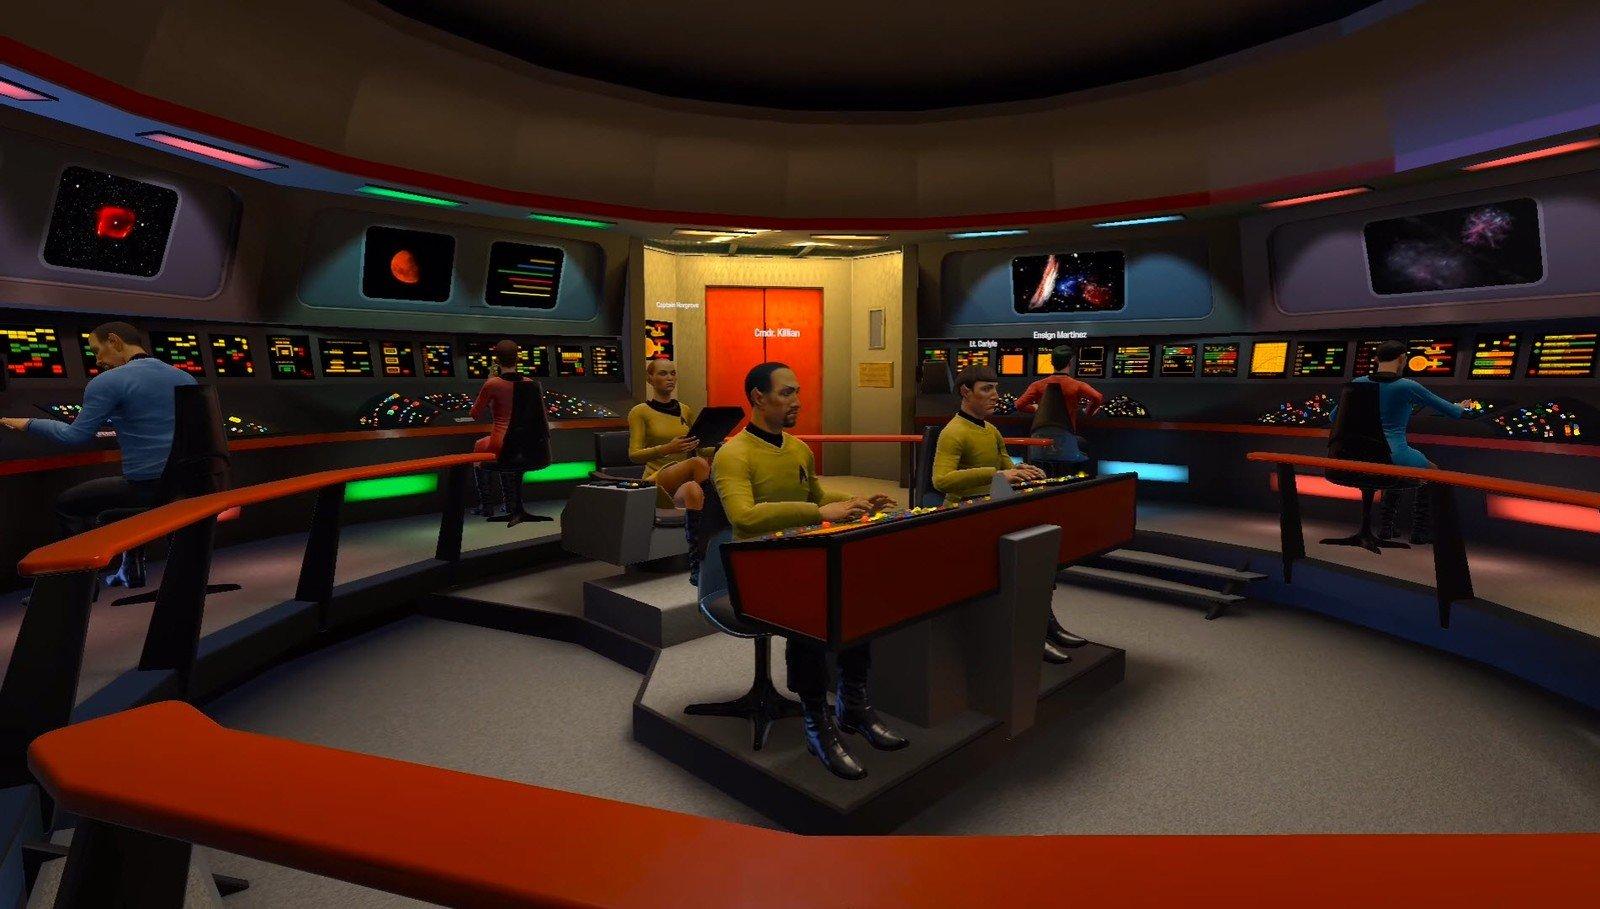 Star Trek Bridge Background